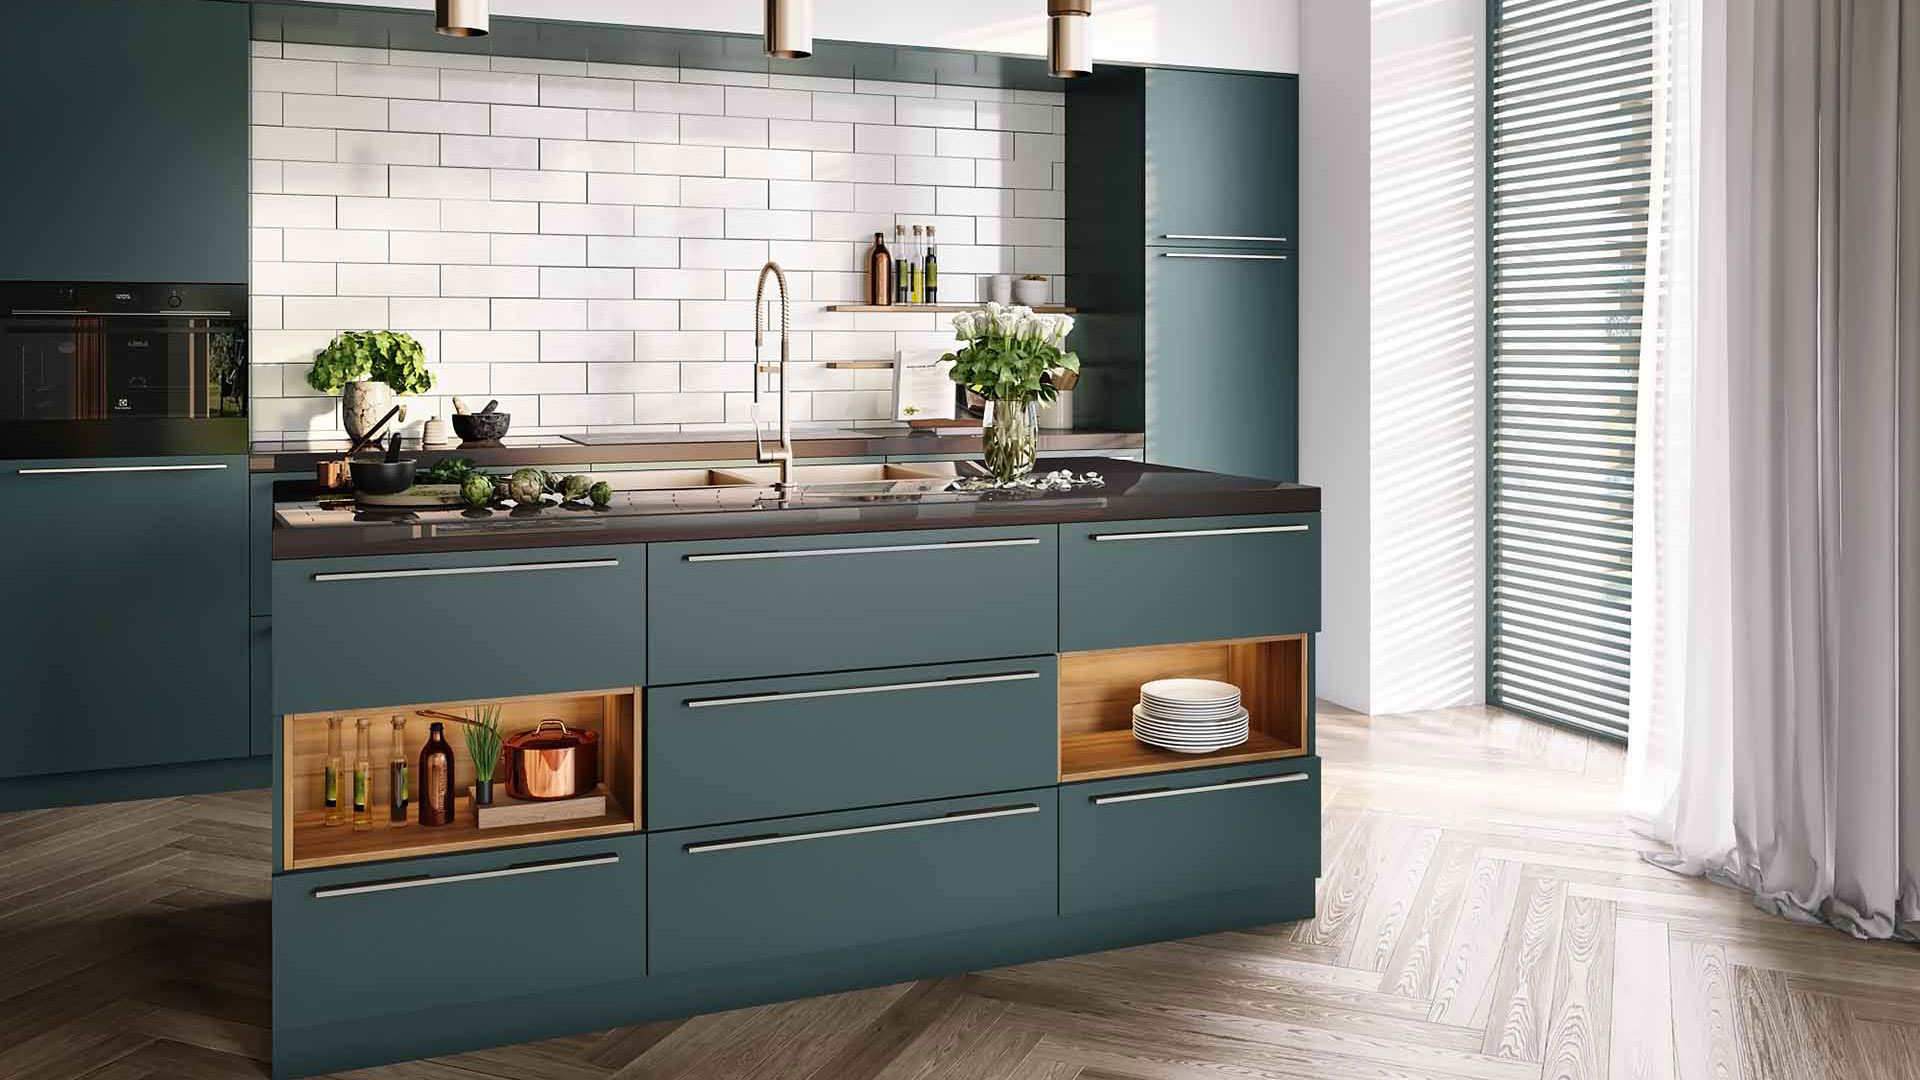 3D Rendering of a Minimalist Kitchen Furniture Set